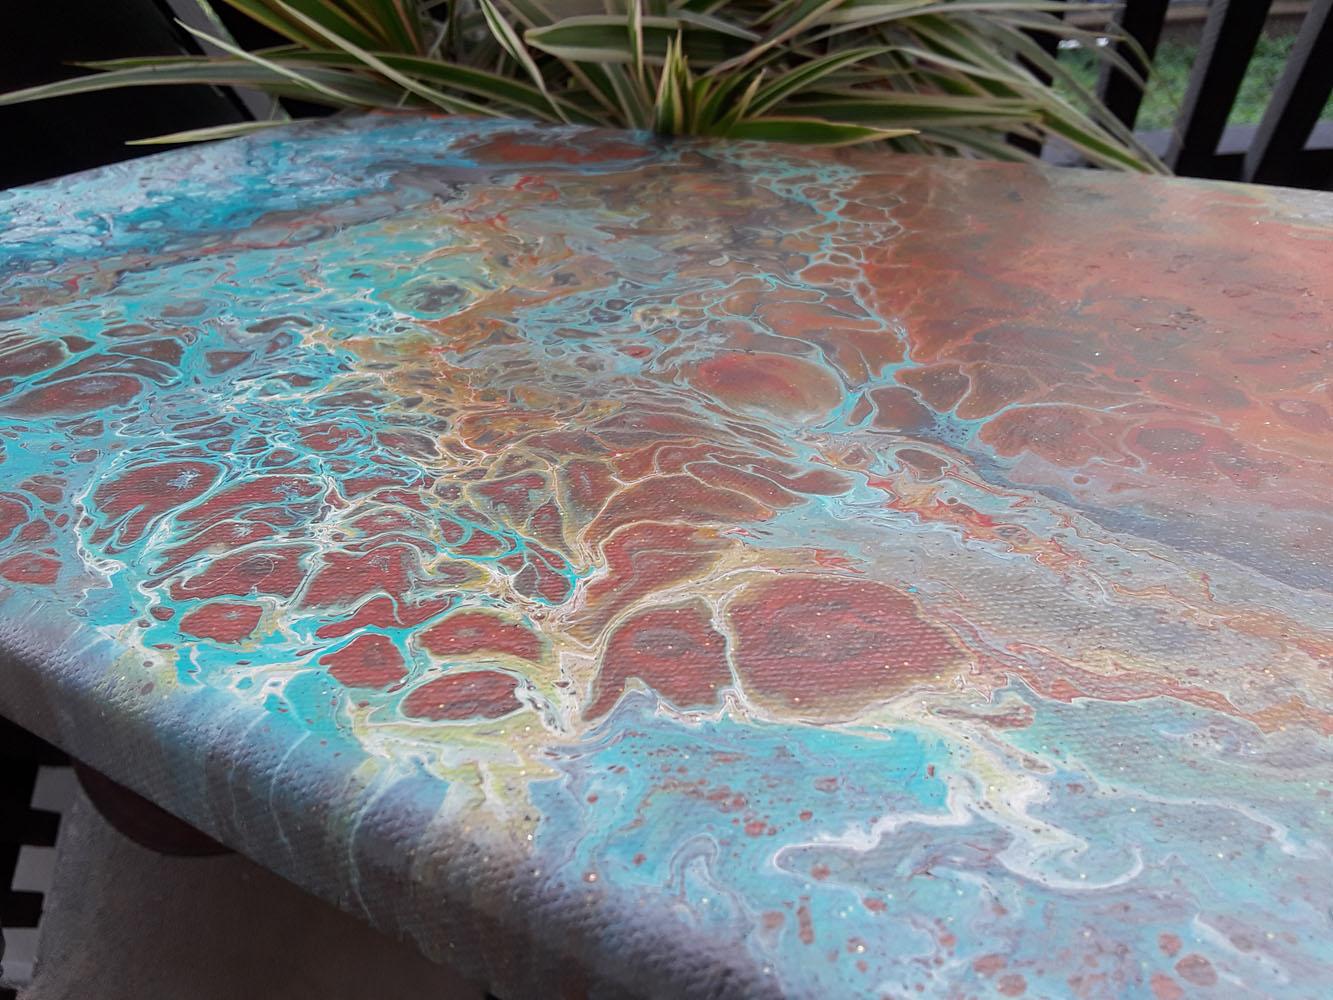 56 Aqua | Pintura Acrílica Fluida, Abstracta Y Conceptual